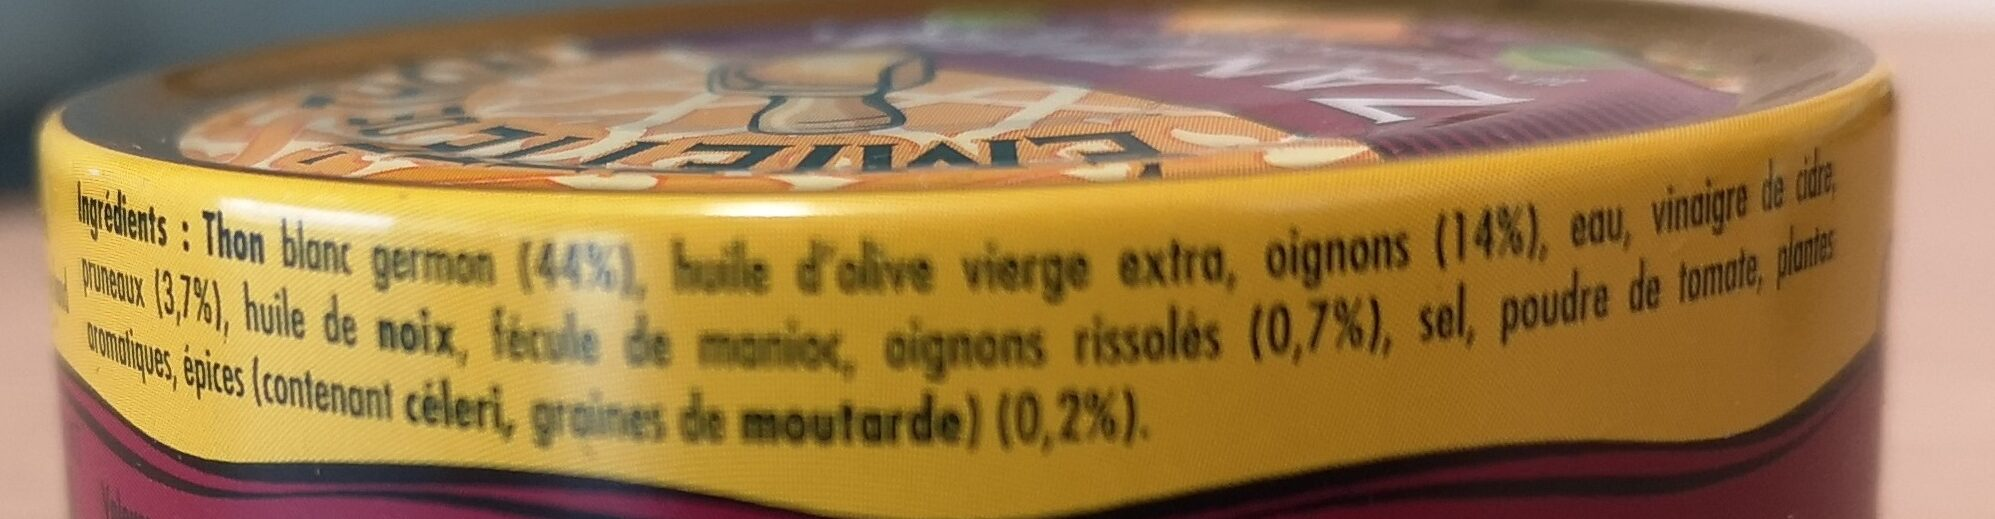 Emietté de thon zanzibar (pruneaux et épices) - Ingrediënten - fr